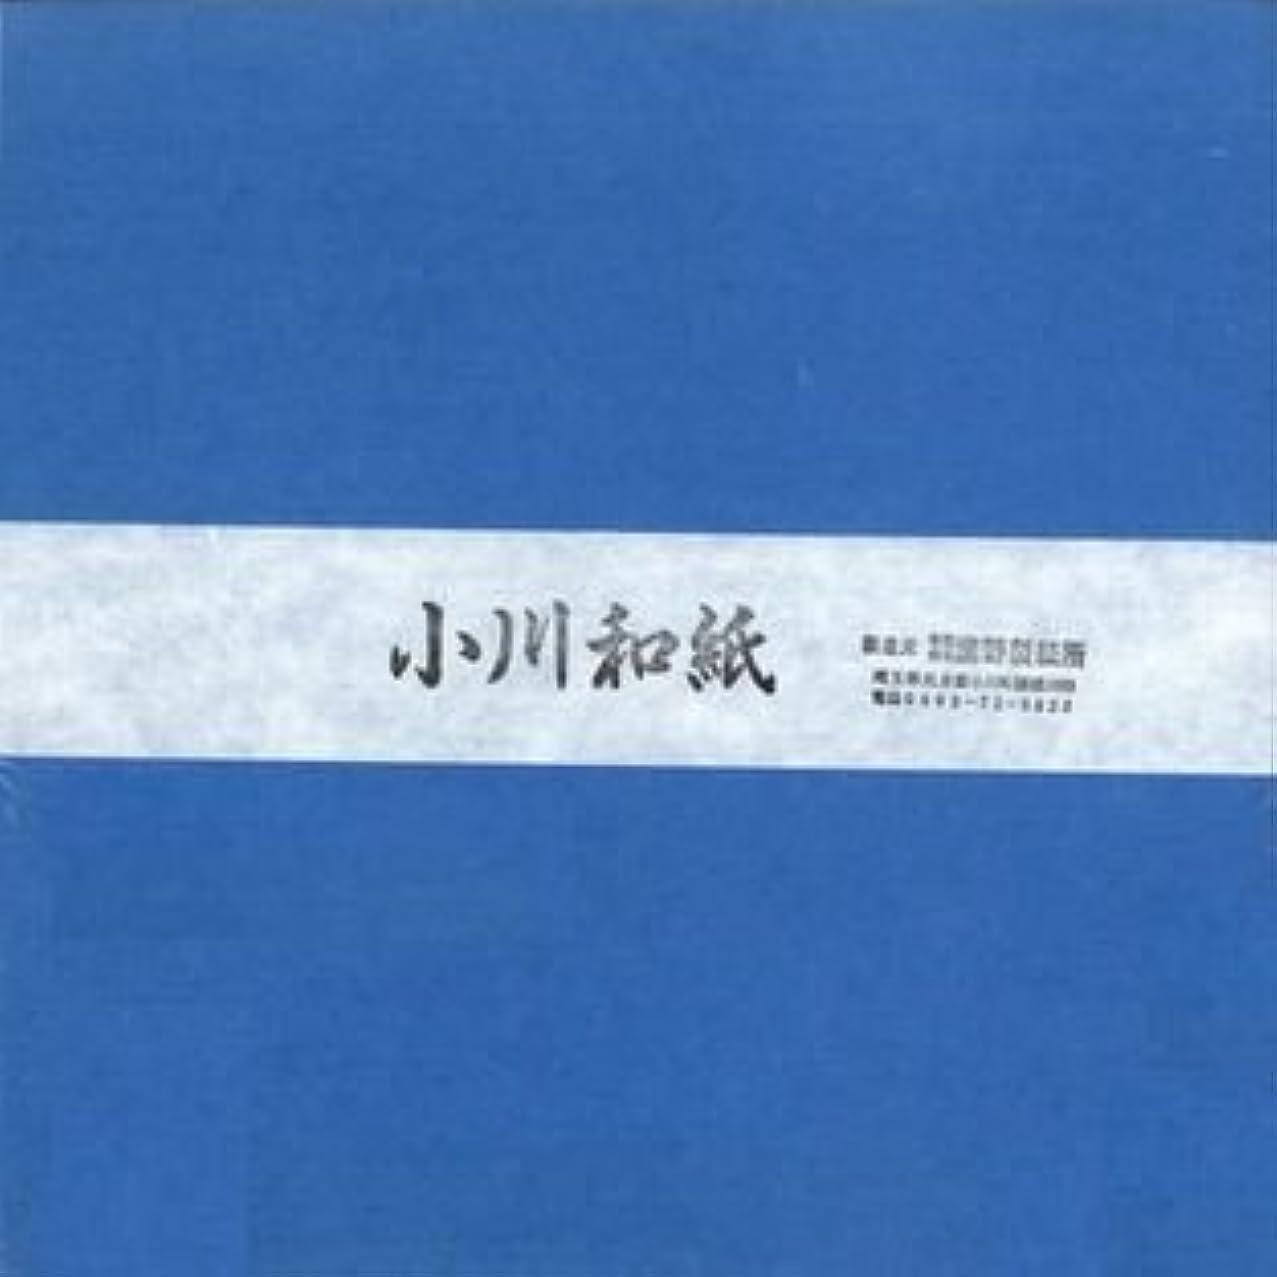 Ogawa(hosokawa) Washi Single Color Paper 25cm(9.84 In), No.16 Sky Blue, 50sheets